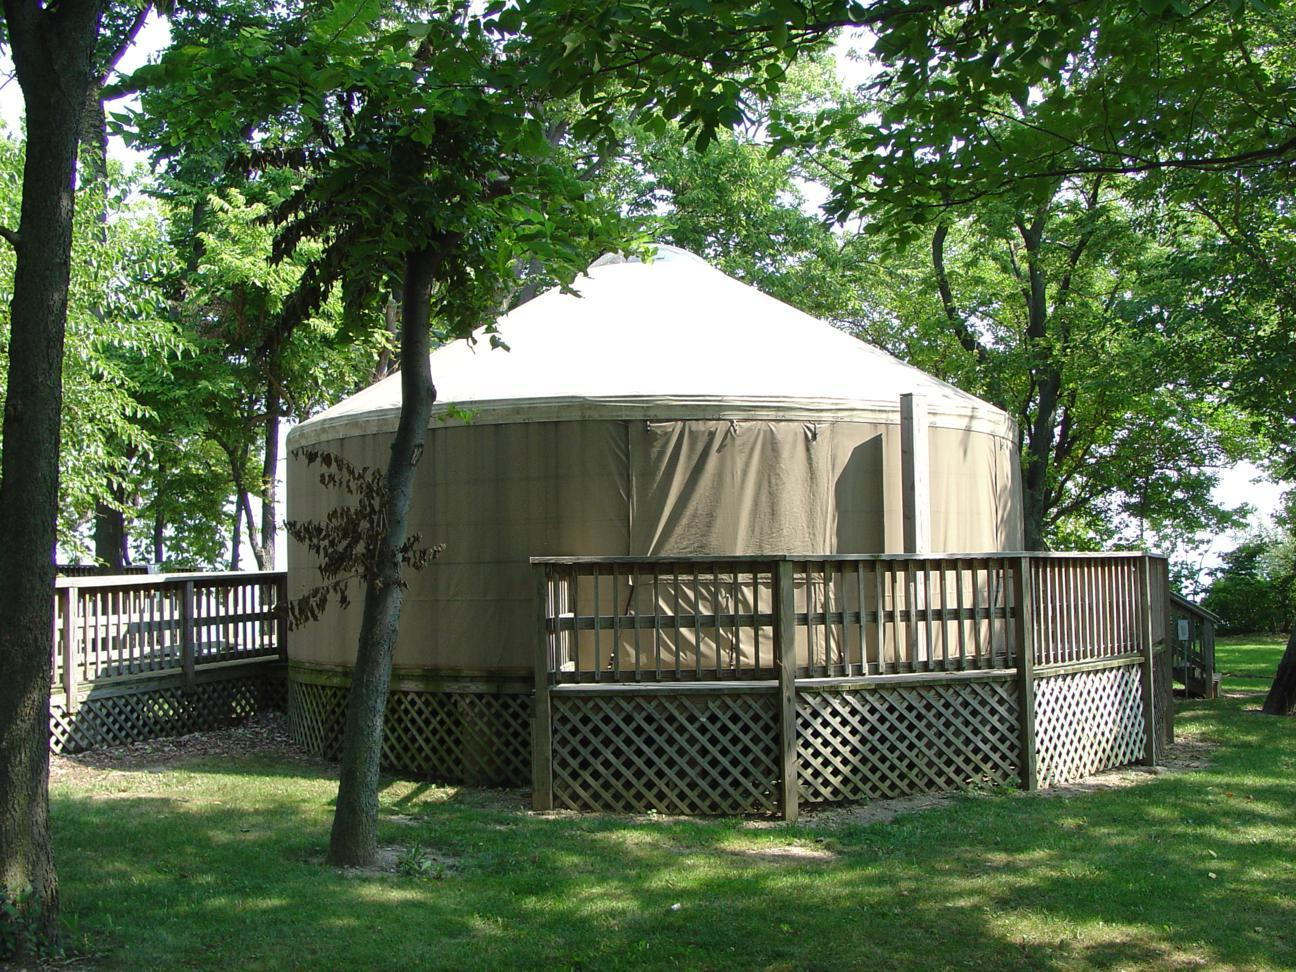 Kelleys Island State Park, Ohio - Camping Reservations & Campgrounds on kelley's island state park campsite map, kelleys island ohio, south bass island state park campground map, kelleys island yurt, kelleys island art,